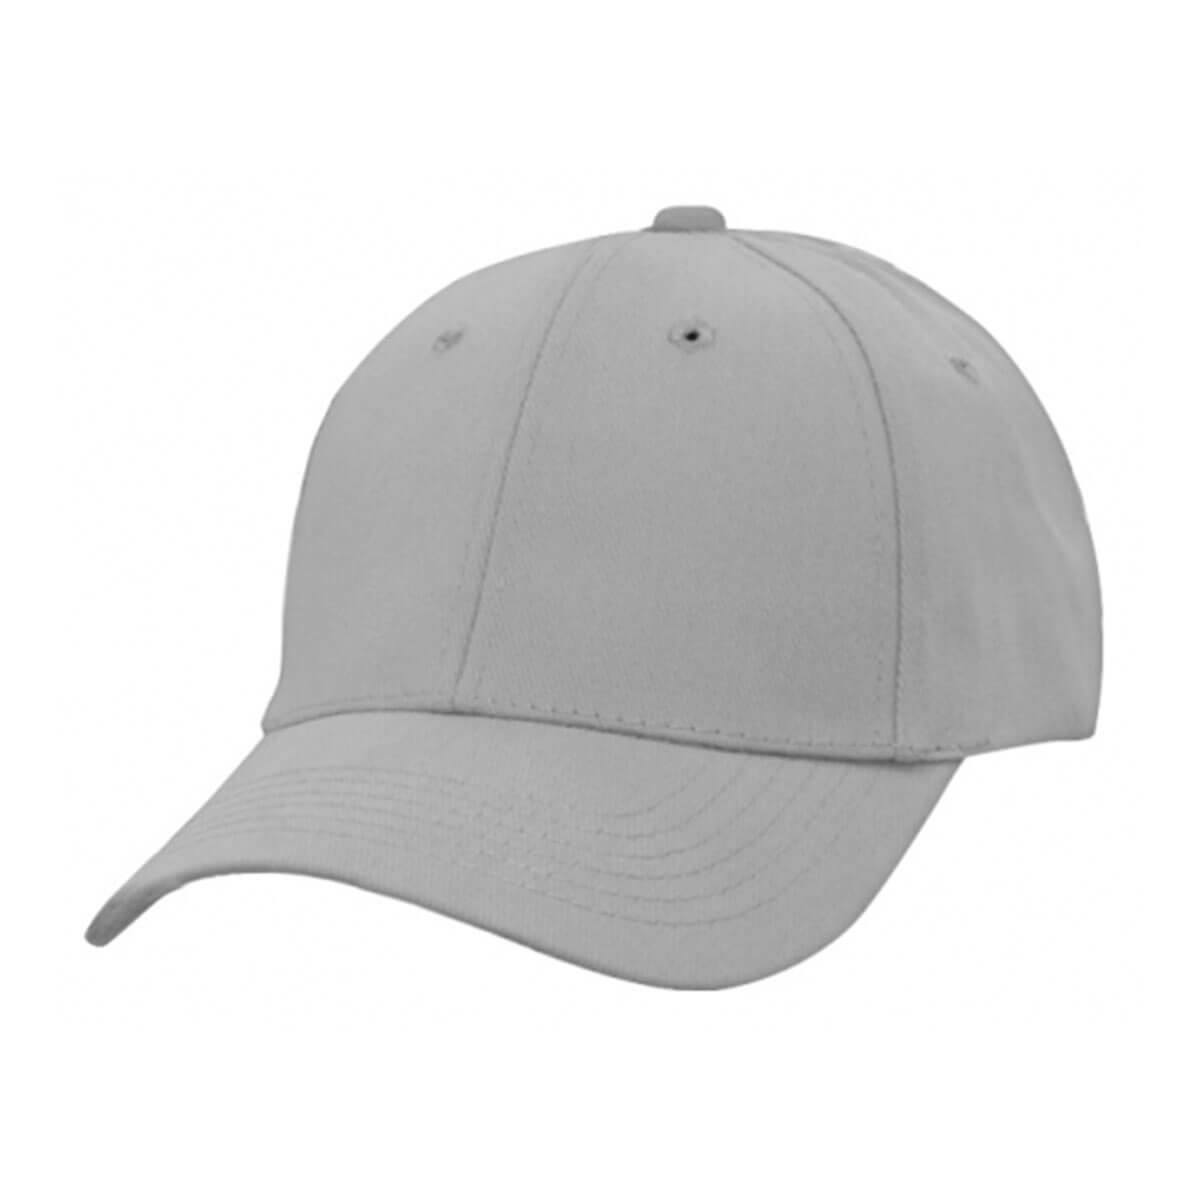 Heavy Brushed Cotton Cap-Dark Grey